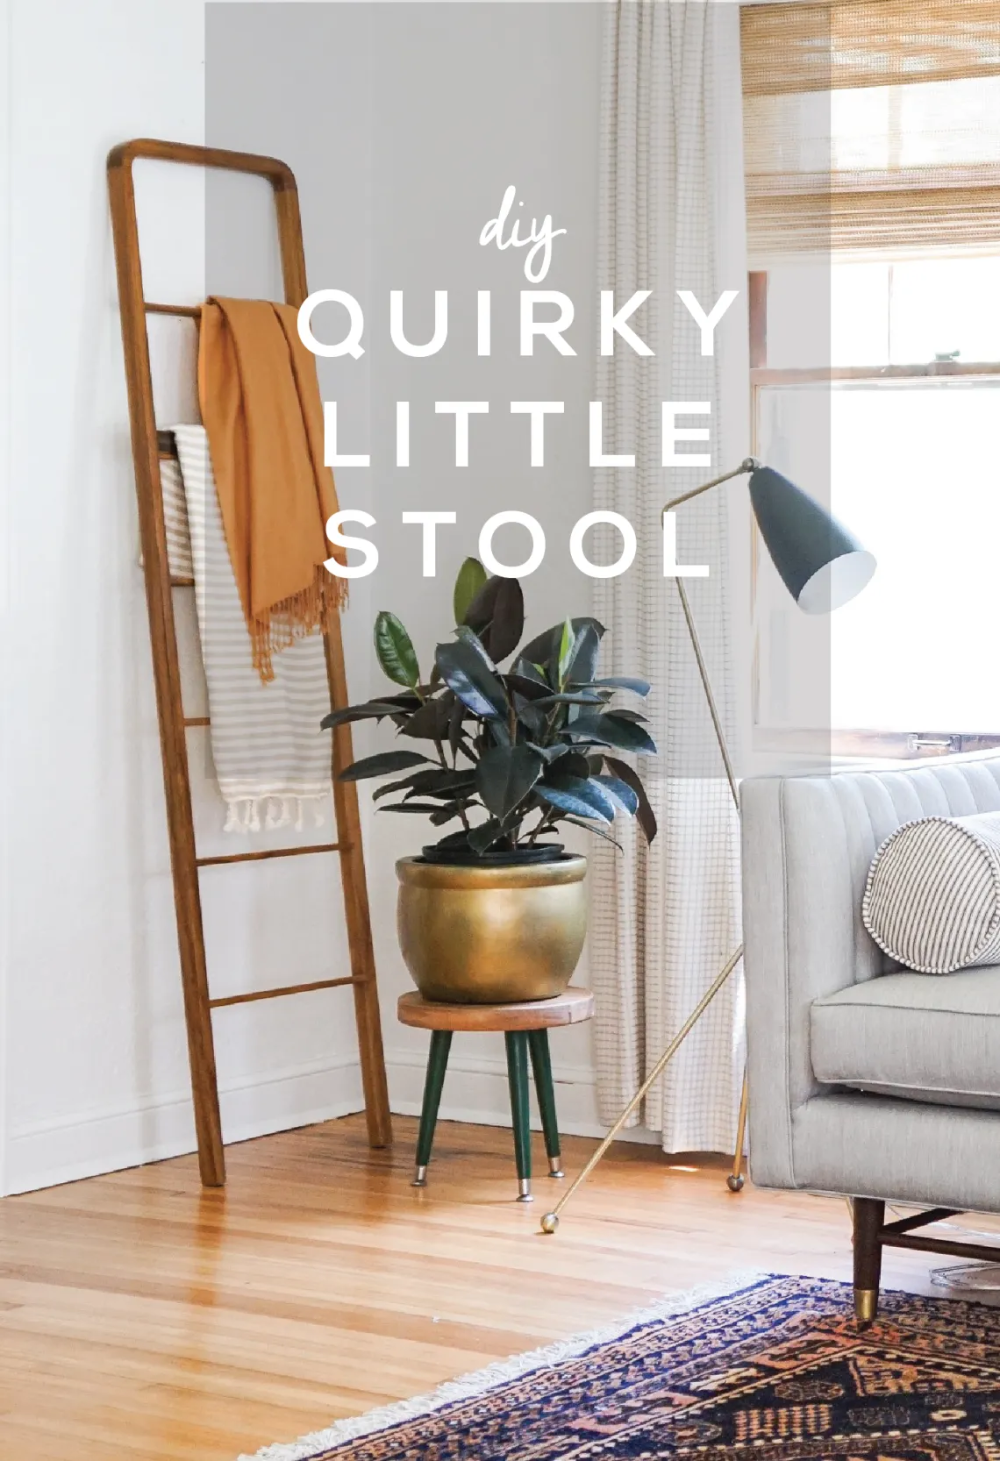 Quirky Little Stool DIY – Francois et Moi – Selbermachen – DIY Ideen